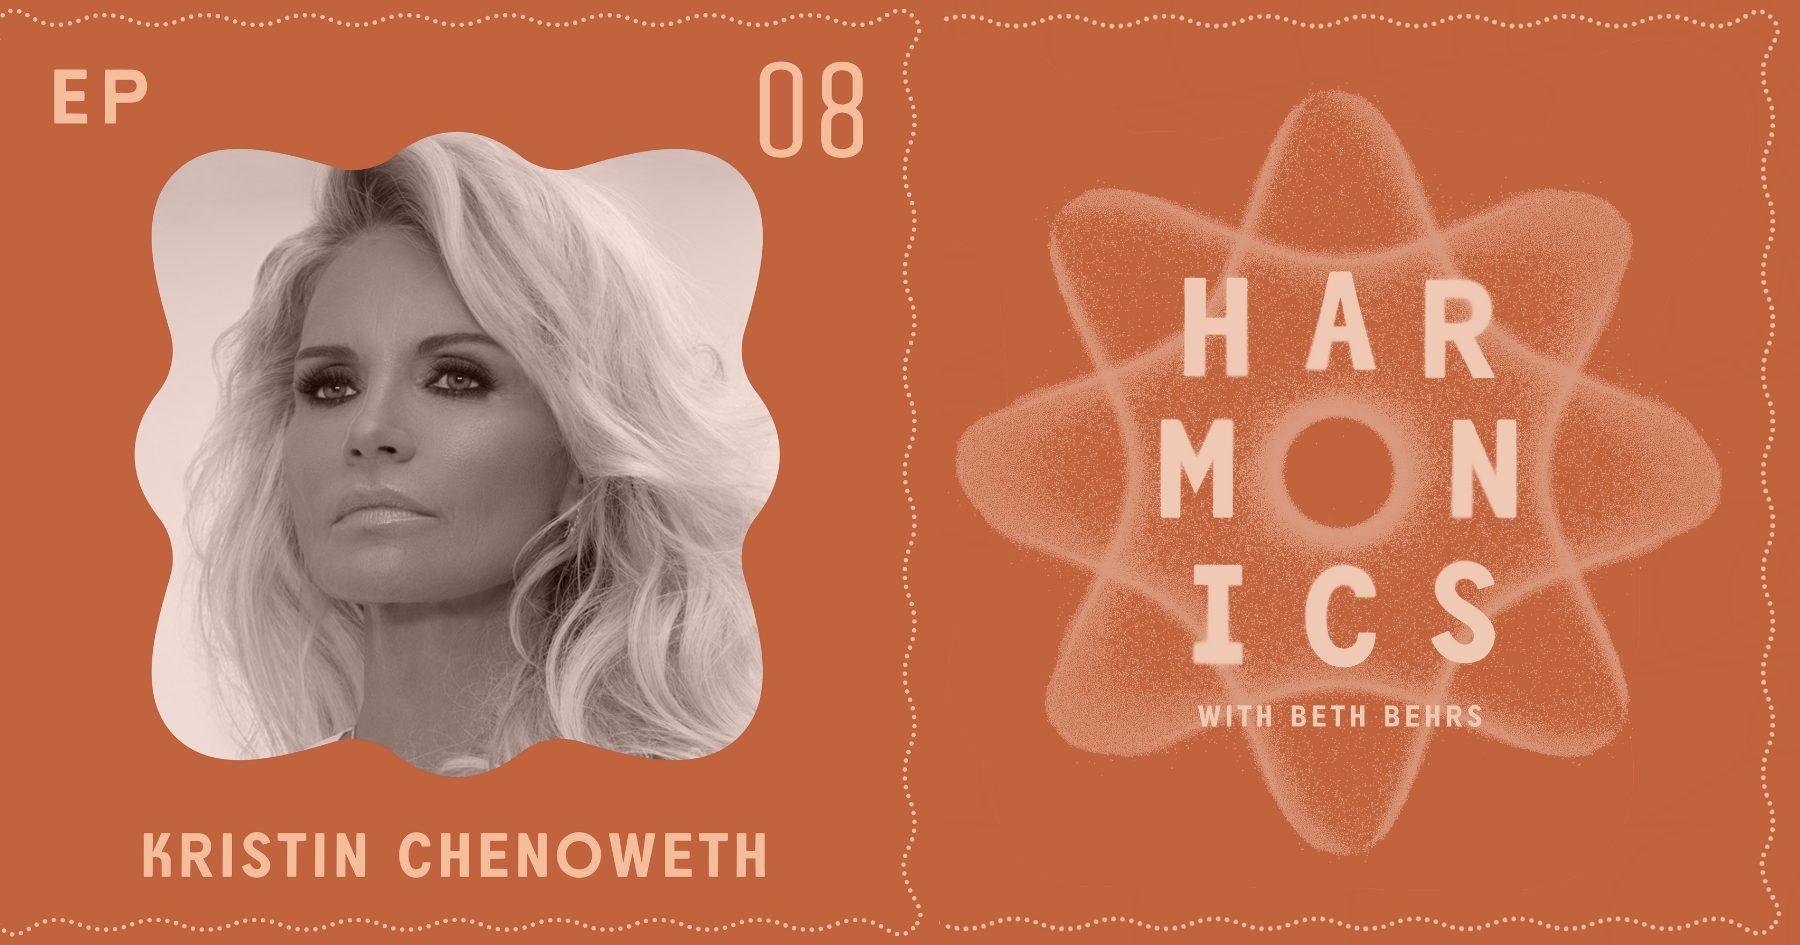 Harmonics with Beth Behrs: Kristin Chenoweth